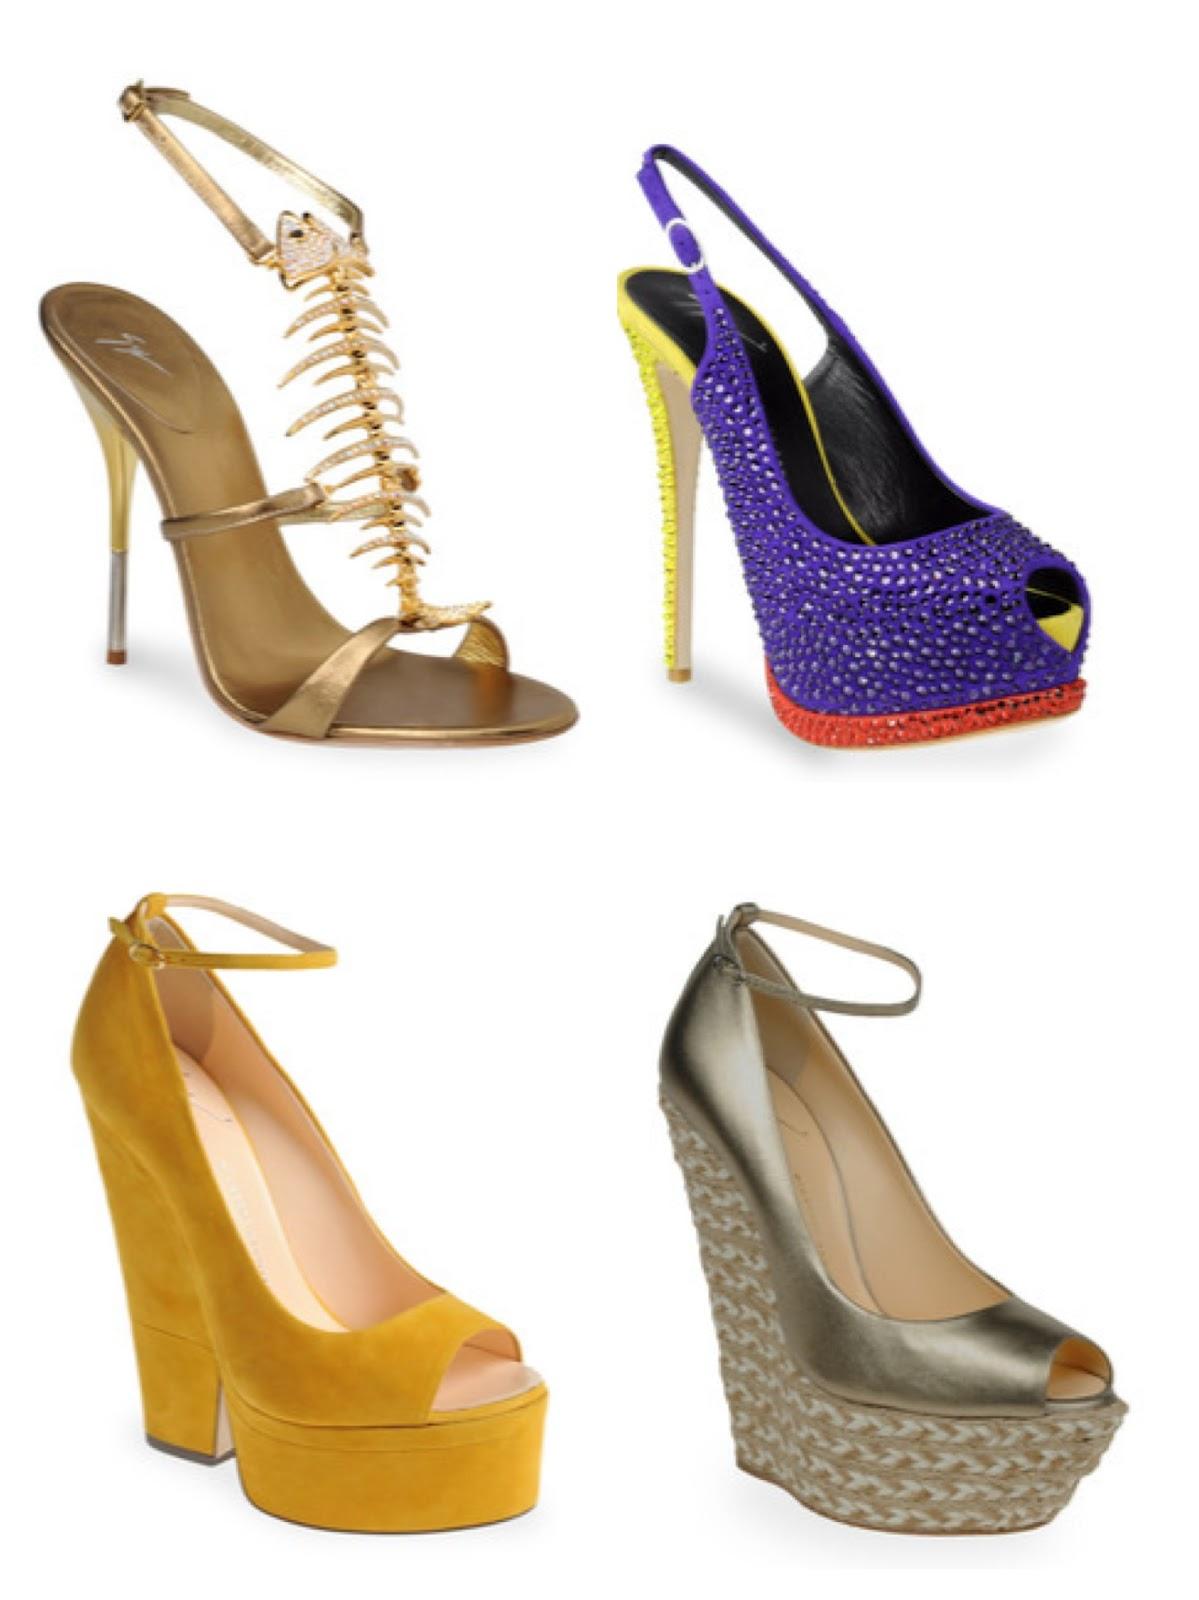 http://3.bp.blogspot.com/-osfXqLCsQyY/T3zGl3gfyII/AAAAAAAAAJo/LqzWDYHtlms/s1600/shoes+1.jpg